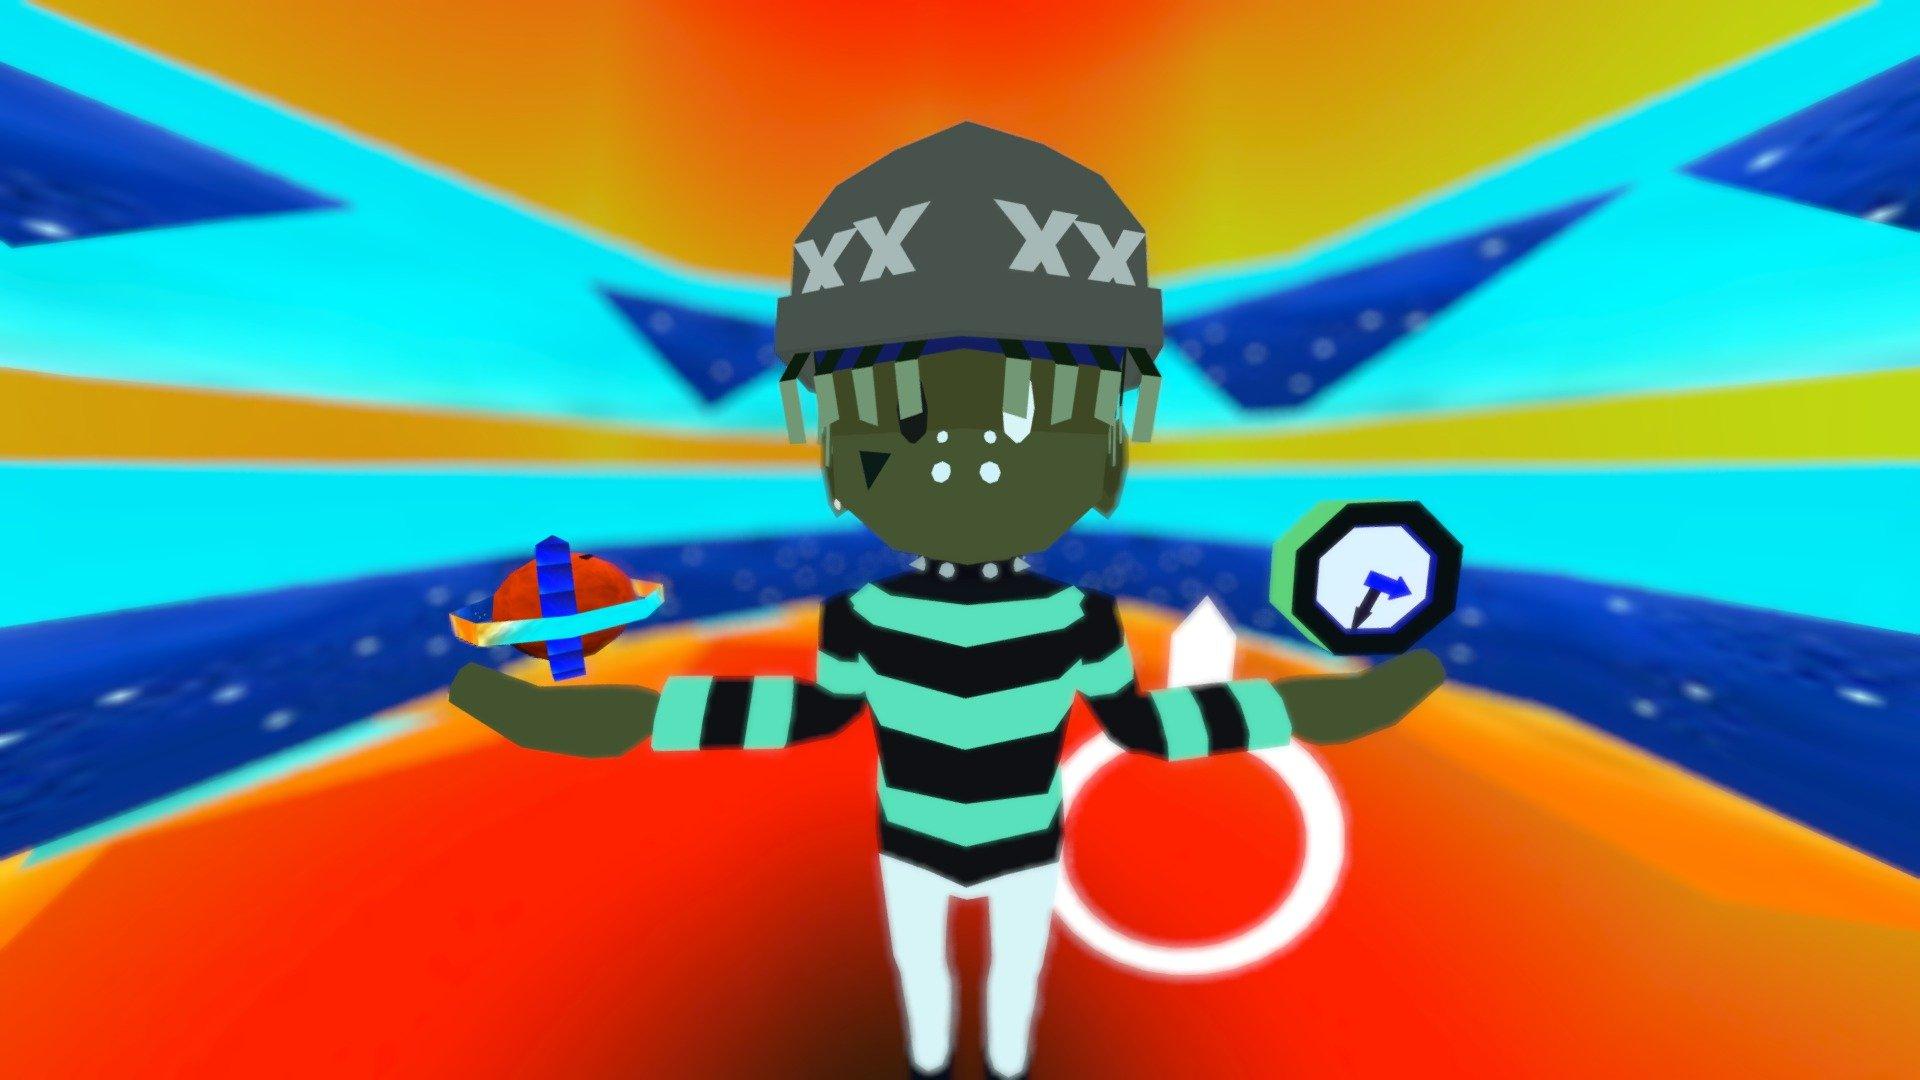 1080p Computer Hd June 2019 Bomber tiger lil uzi vert necklace danish poster pictur box music hip hop hoodi pendant rapper lil uzi vert t shirt music poster vintage. 1080p computer hd june 2019